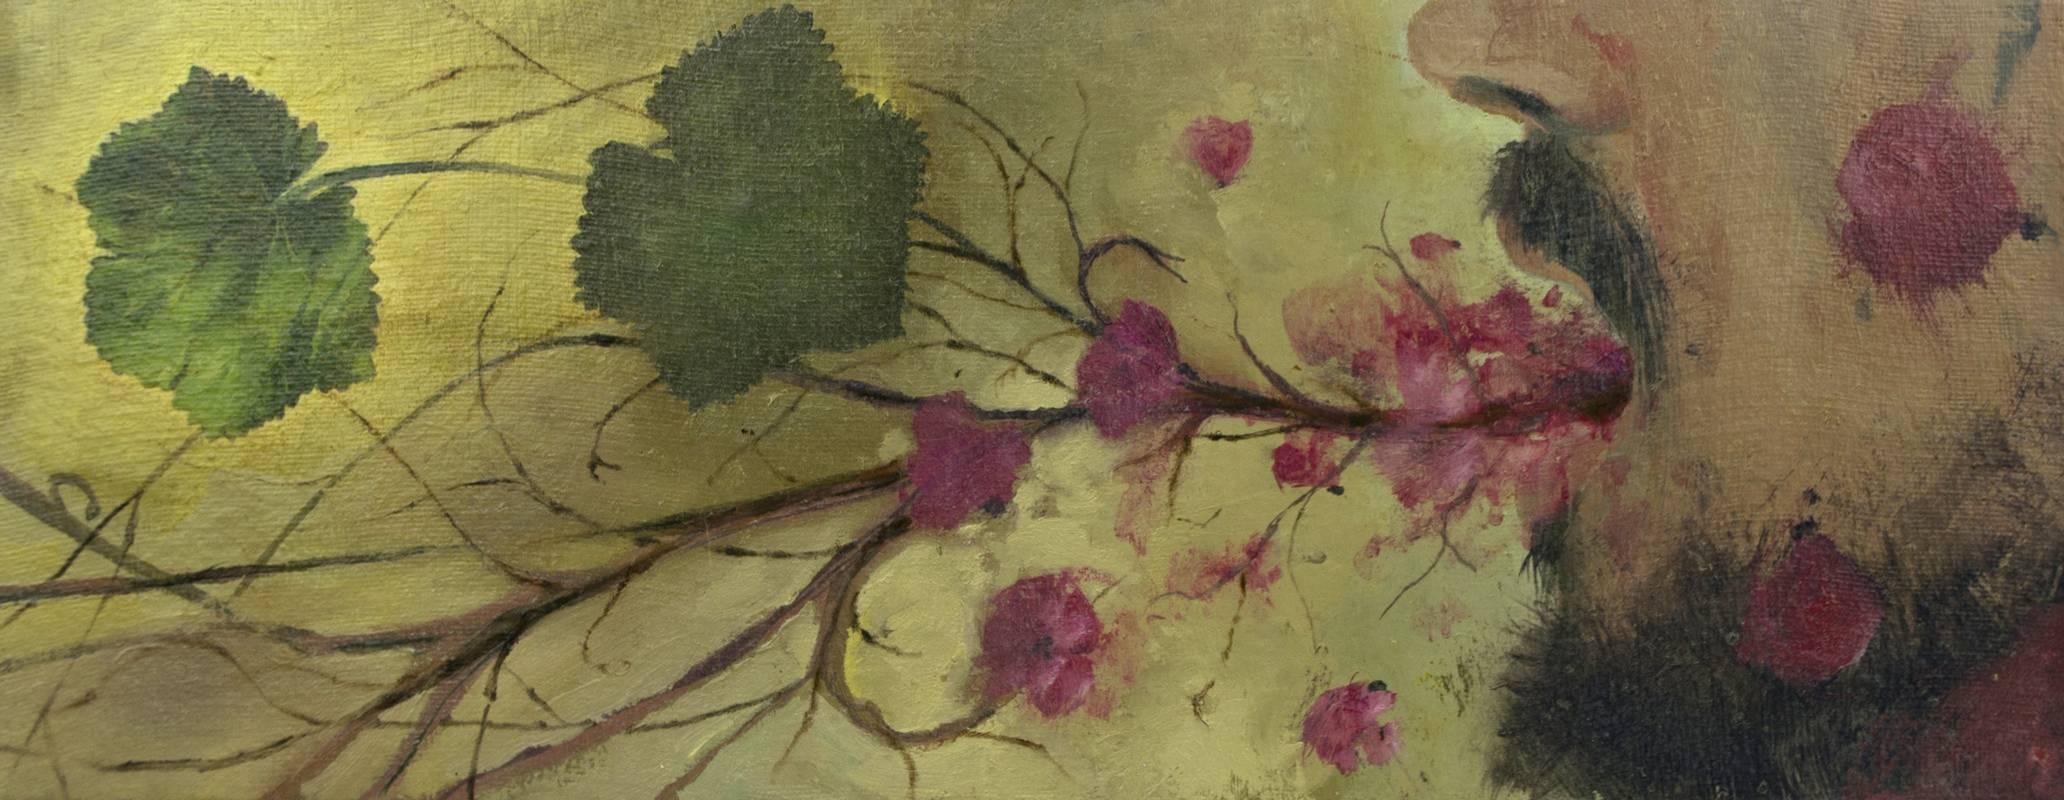 Obra Escupe flores – Serie Cocina de Autor – Artista pintor Antonio Morales Prats